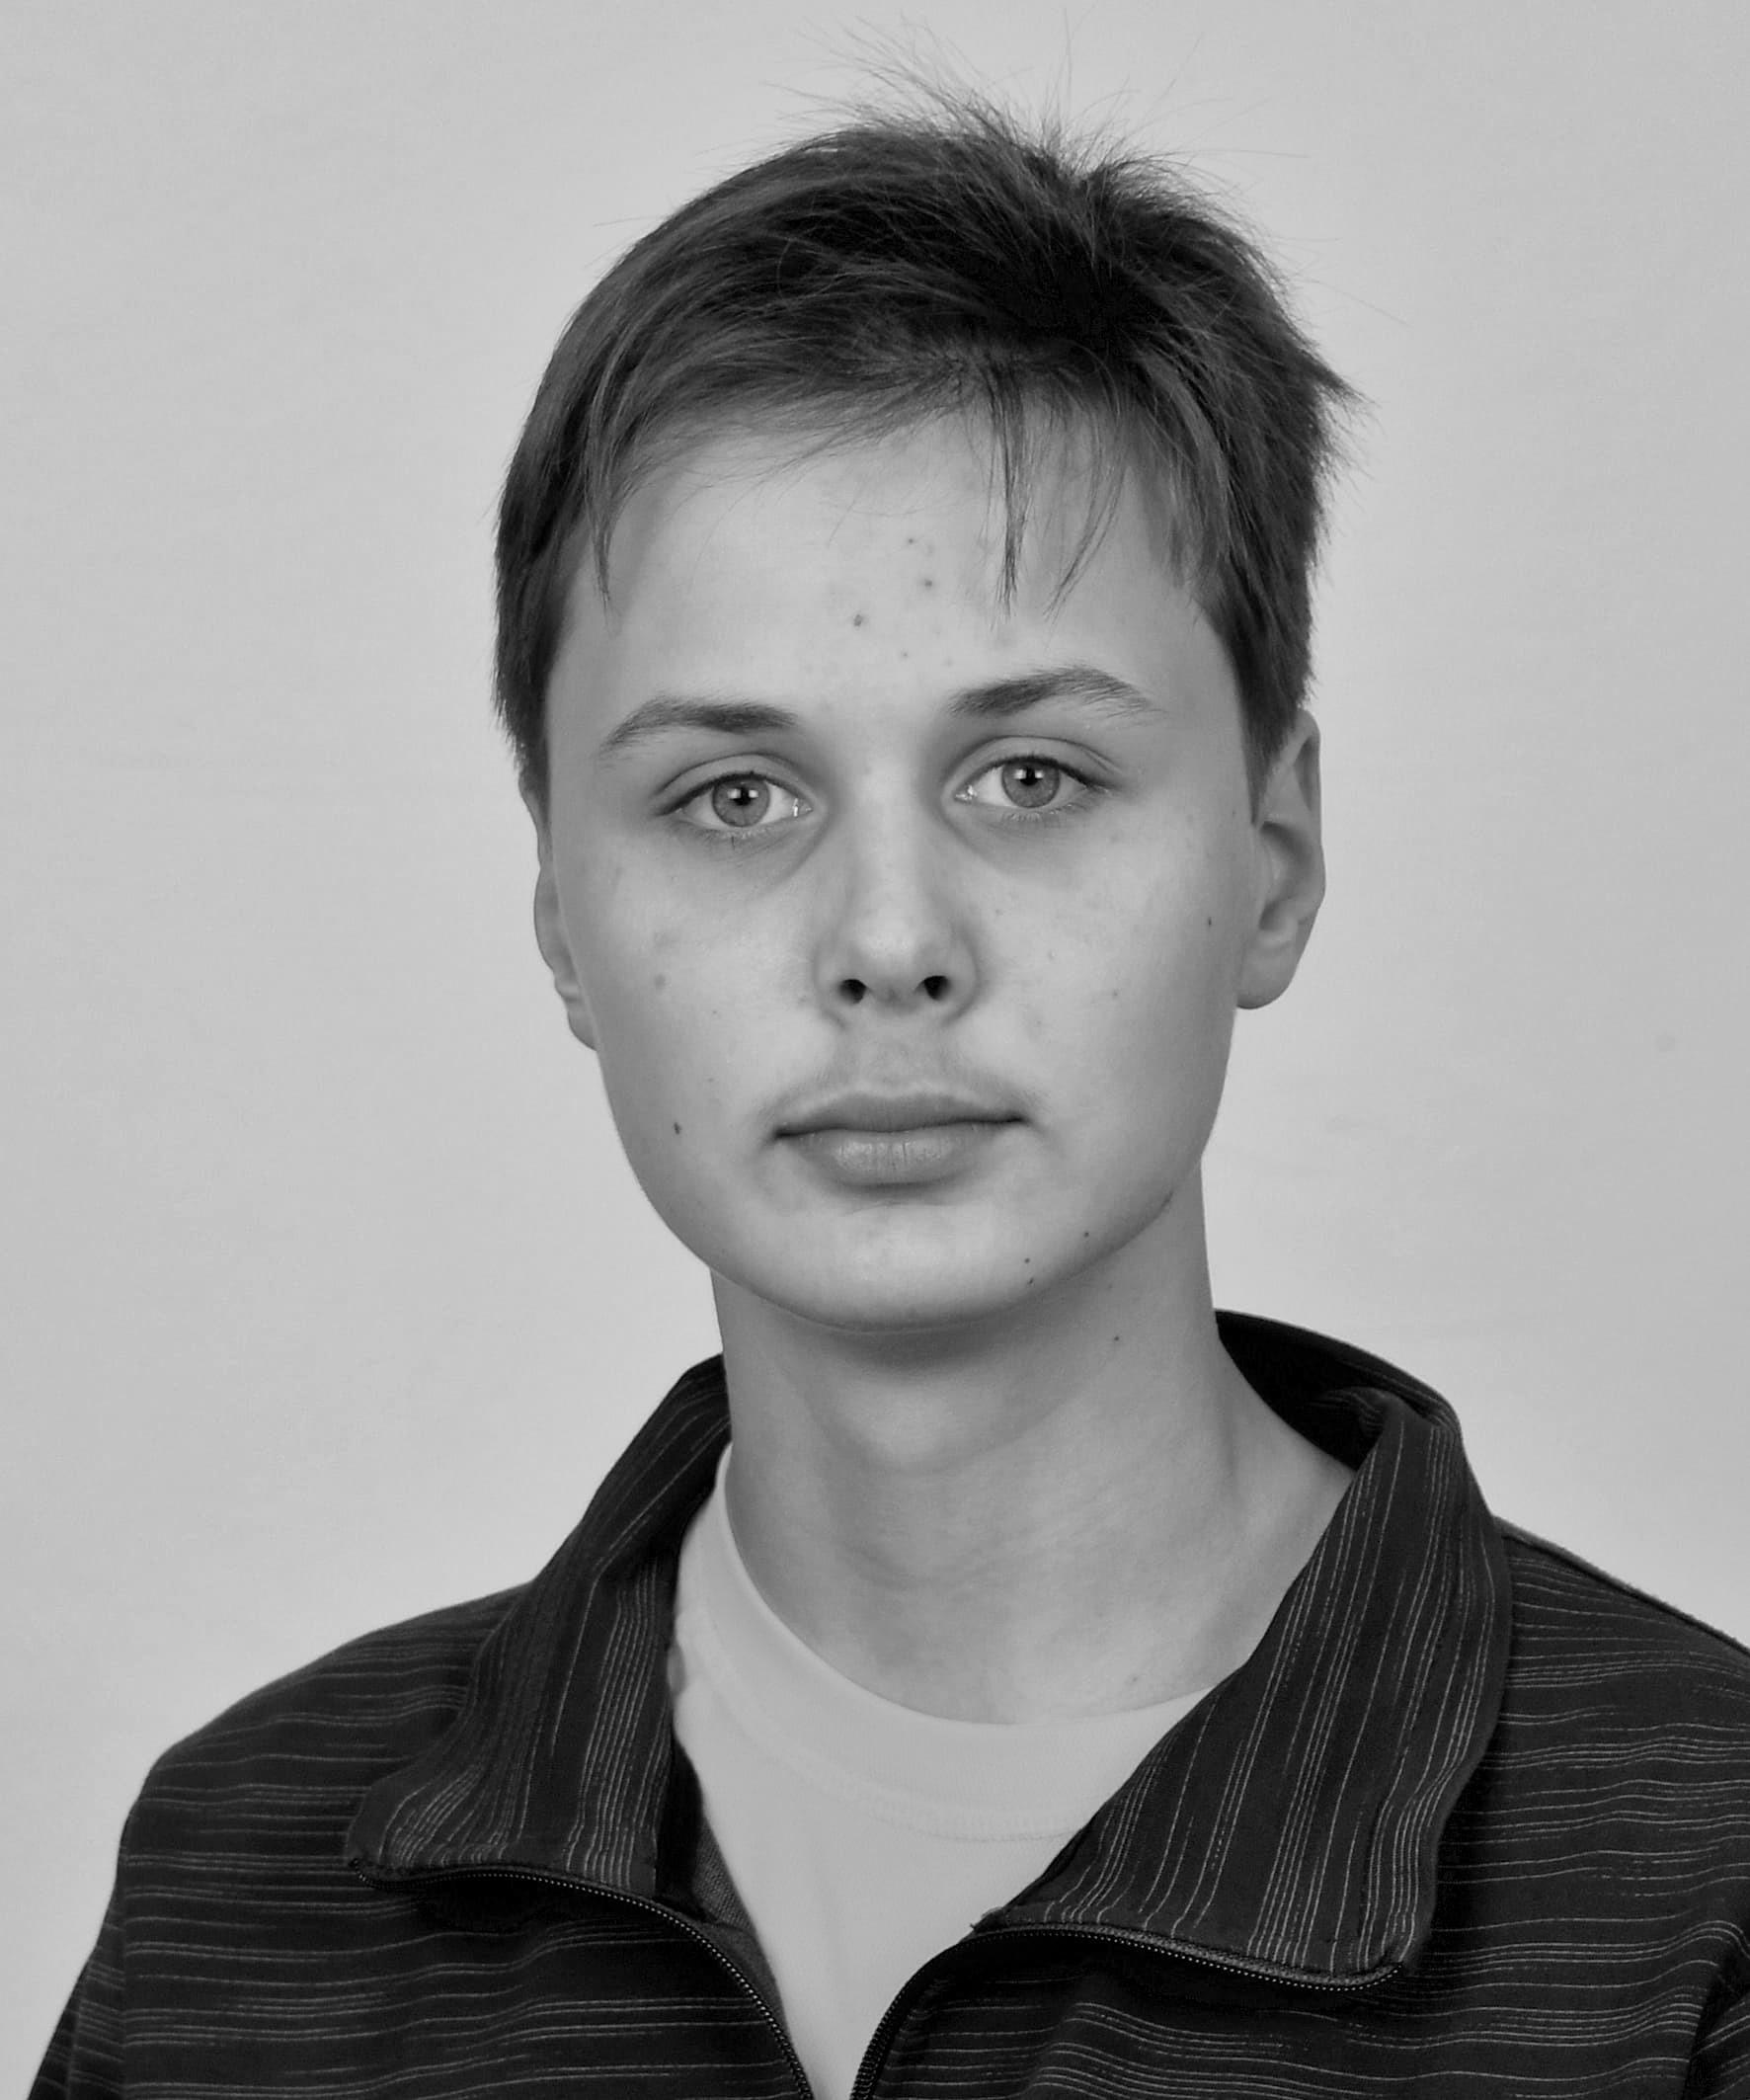 Michal Solny